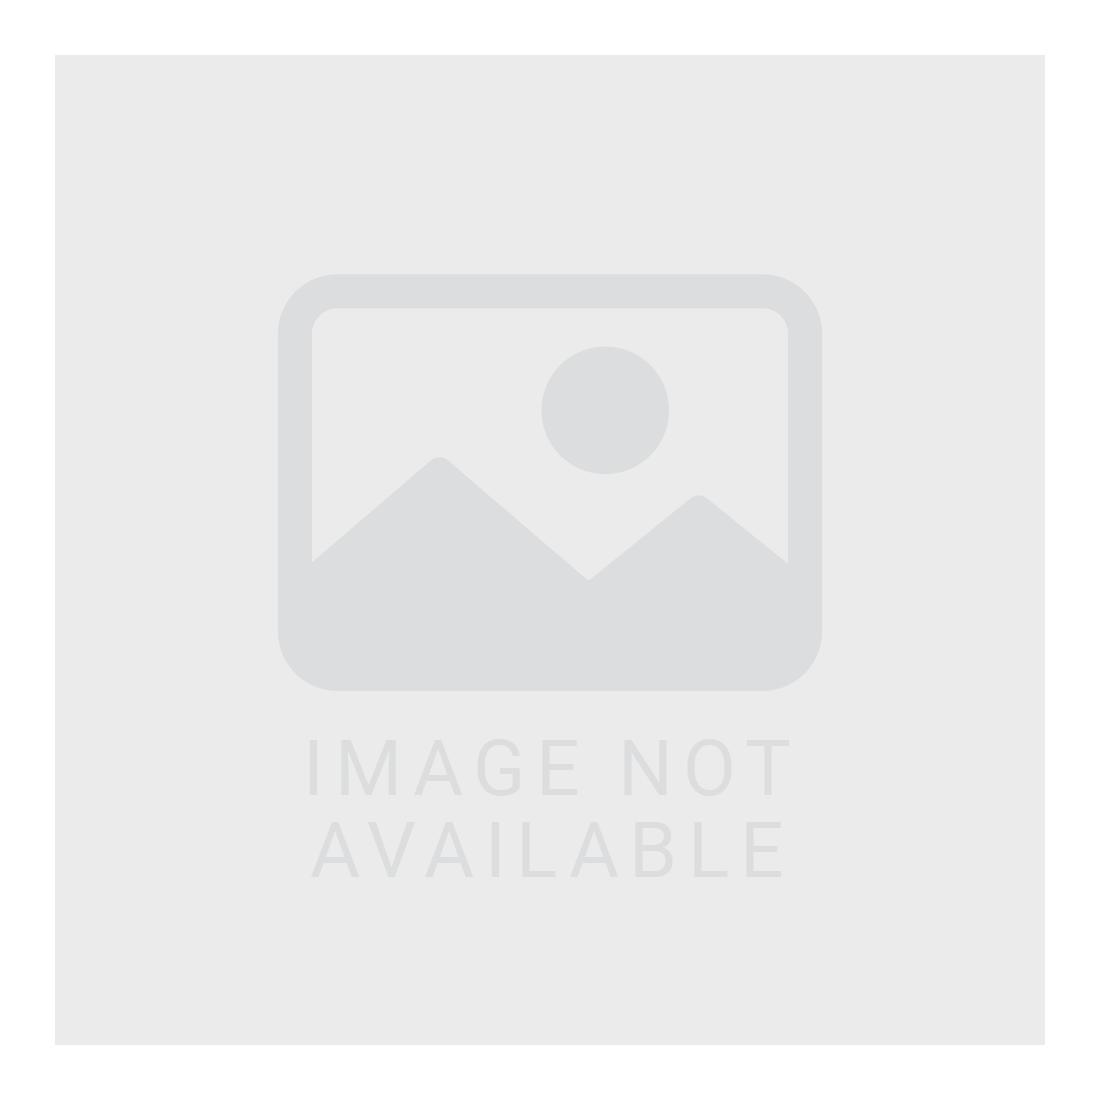 $50 Alfa Romeo Gift Card